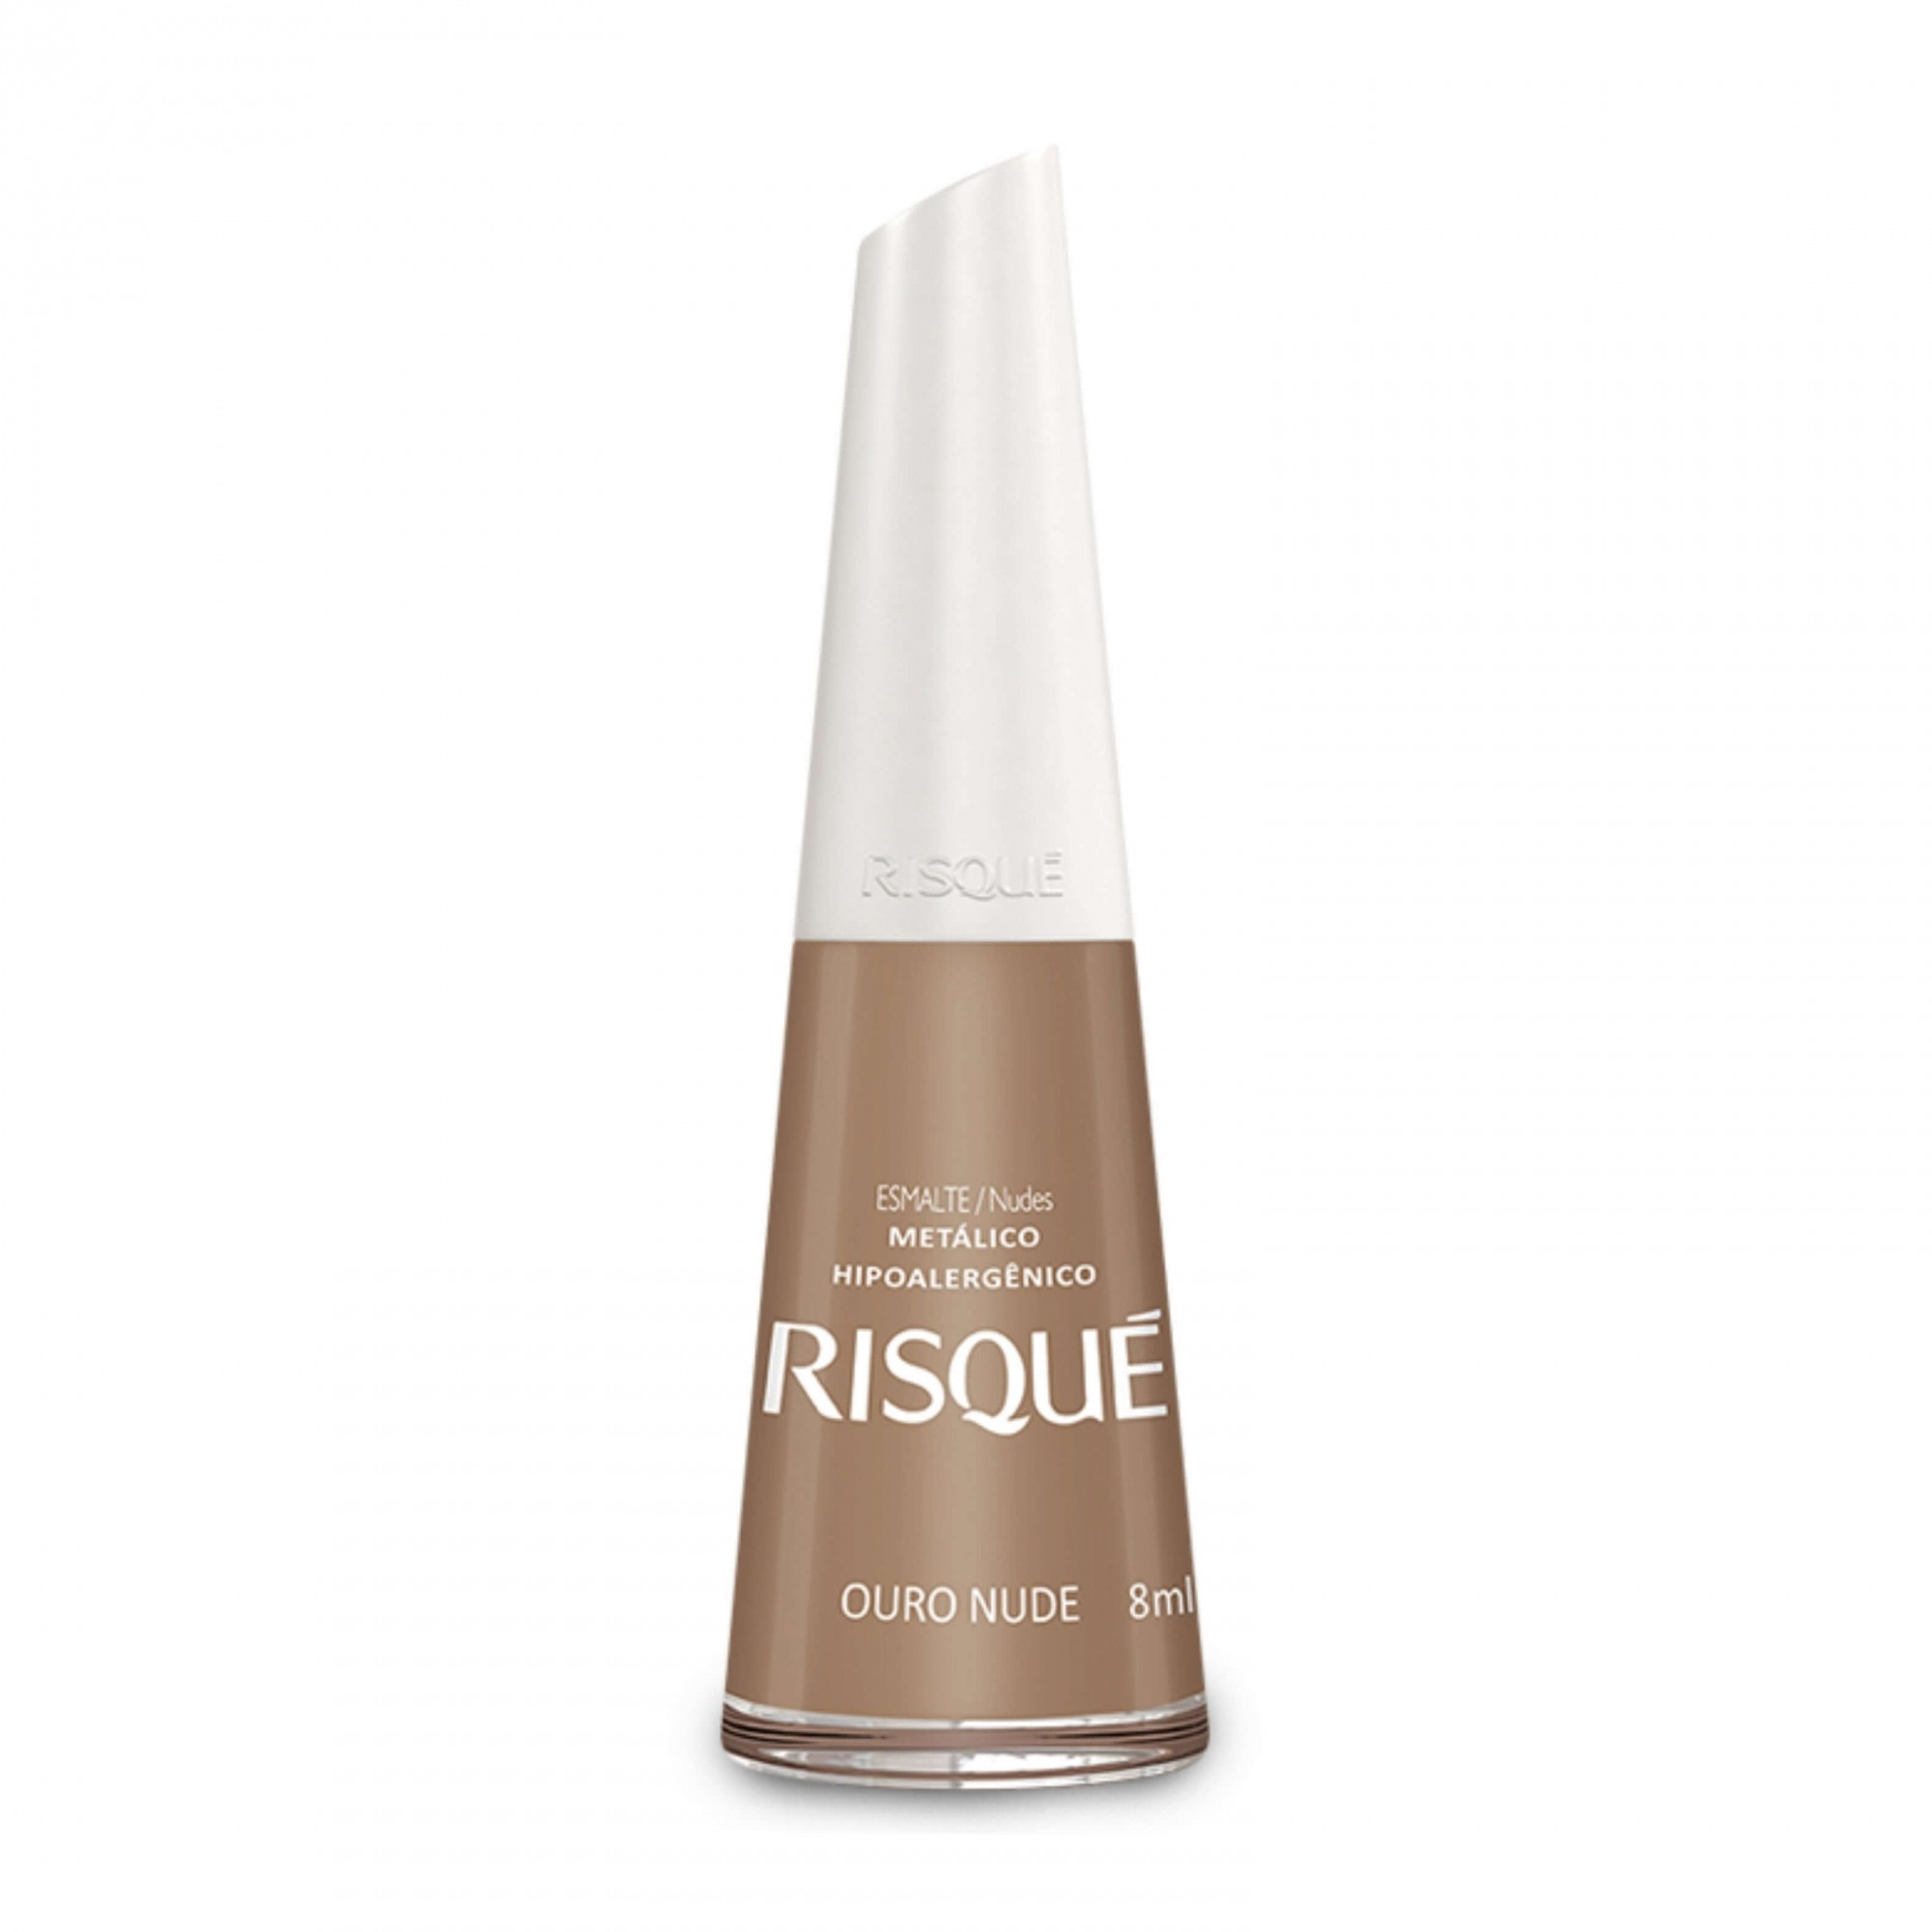 Esmalte Nude Risque Ouro Nude 8ml